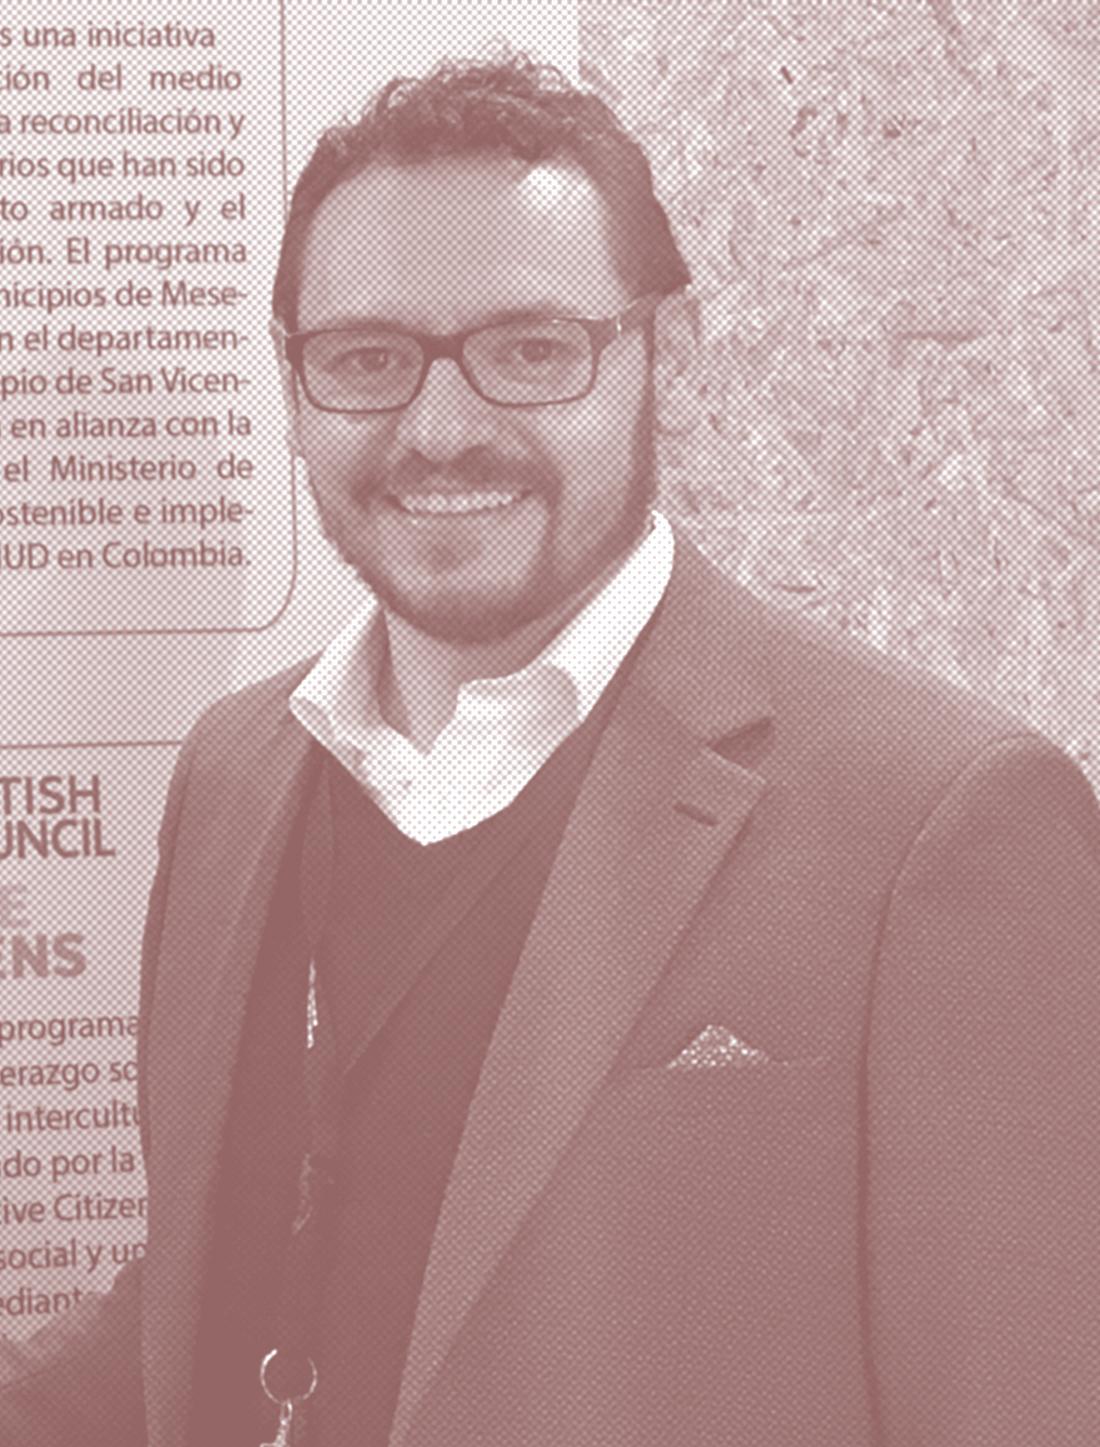 Daniel Alejandro Rojas